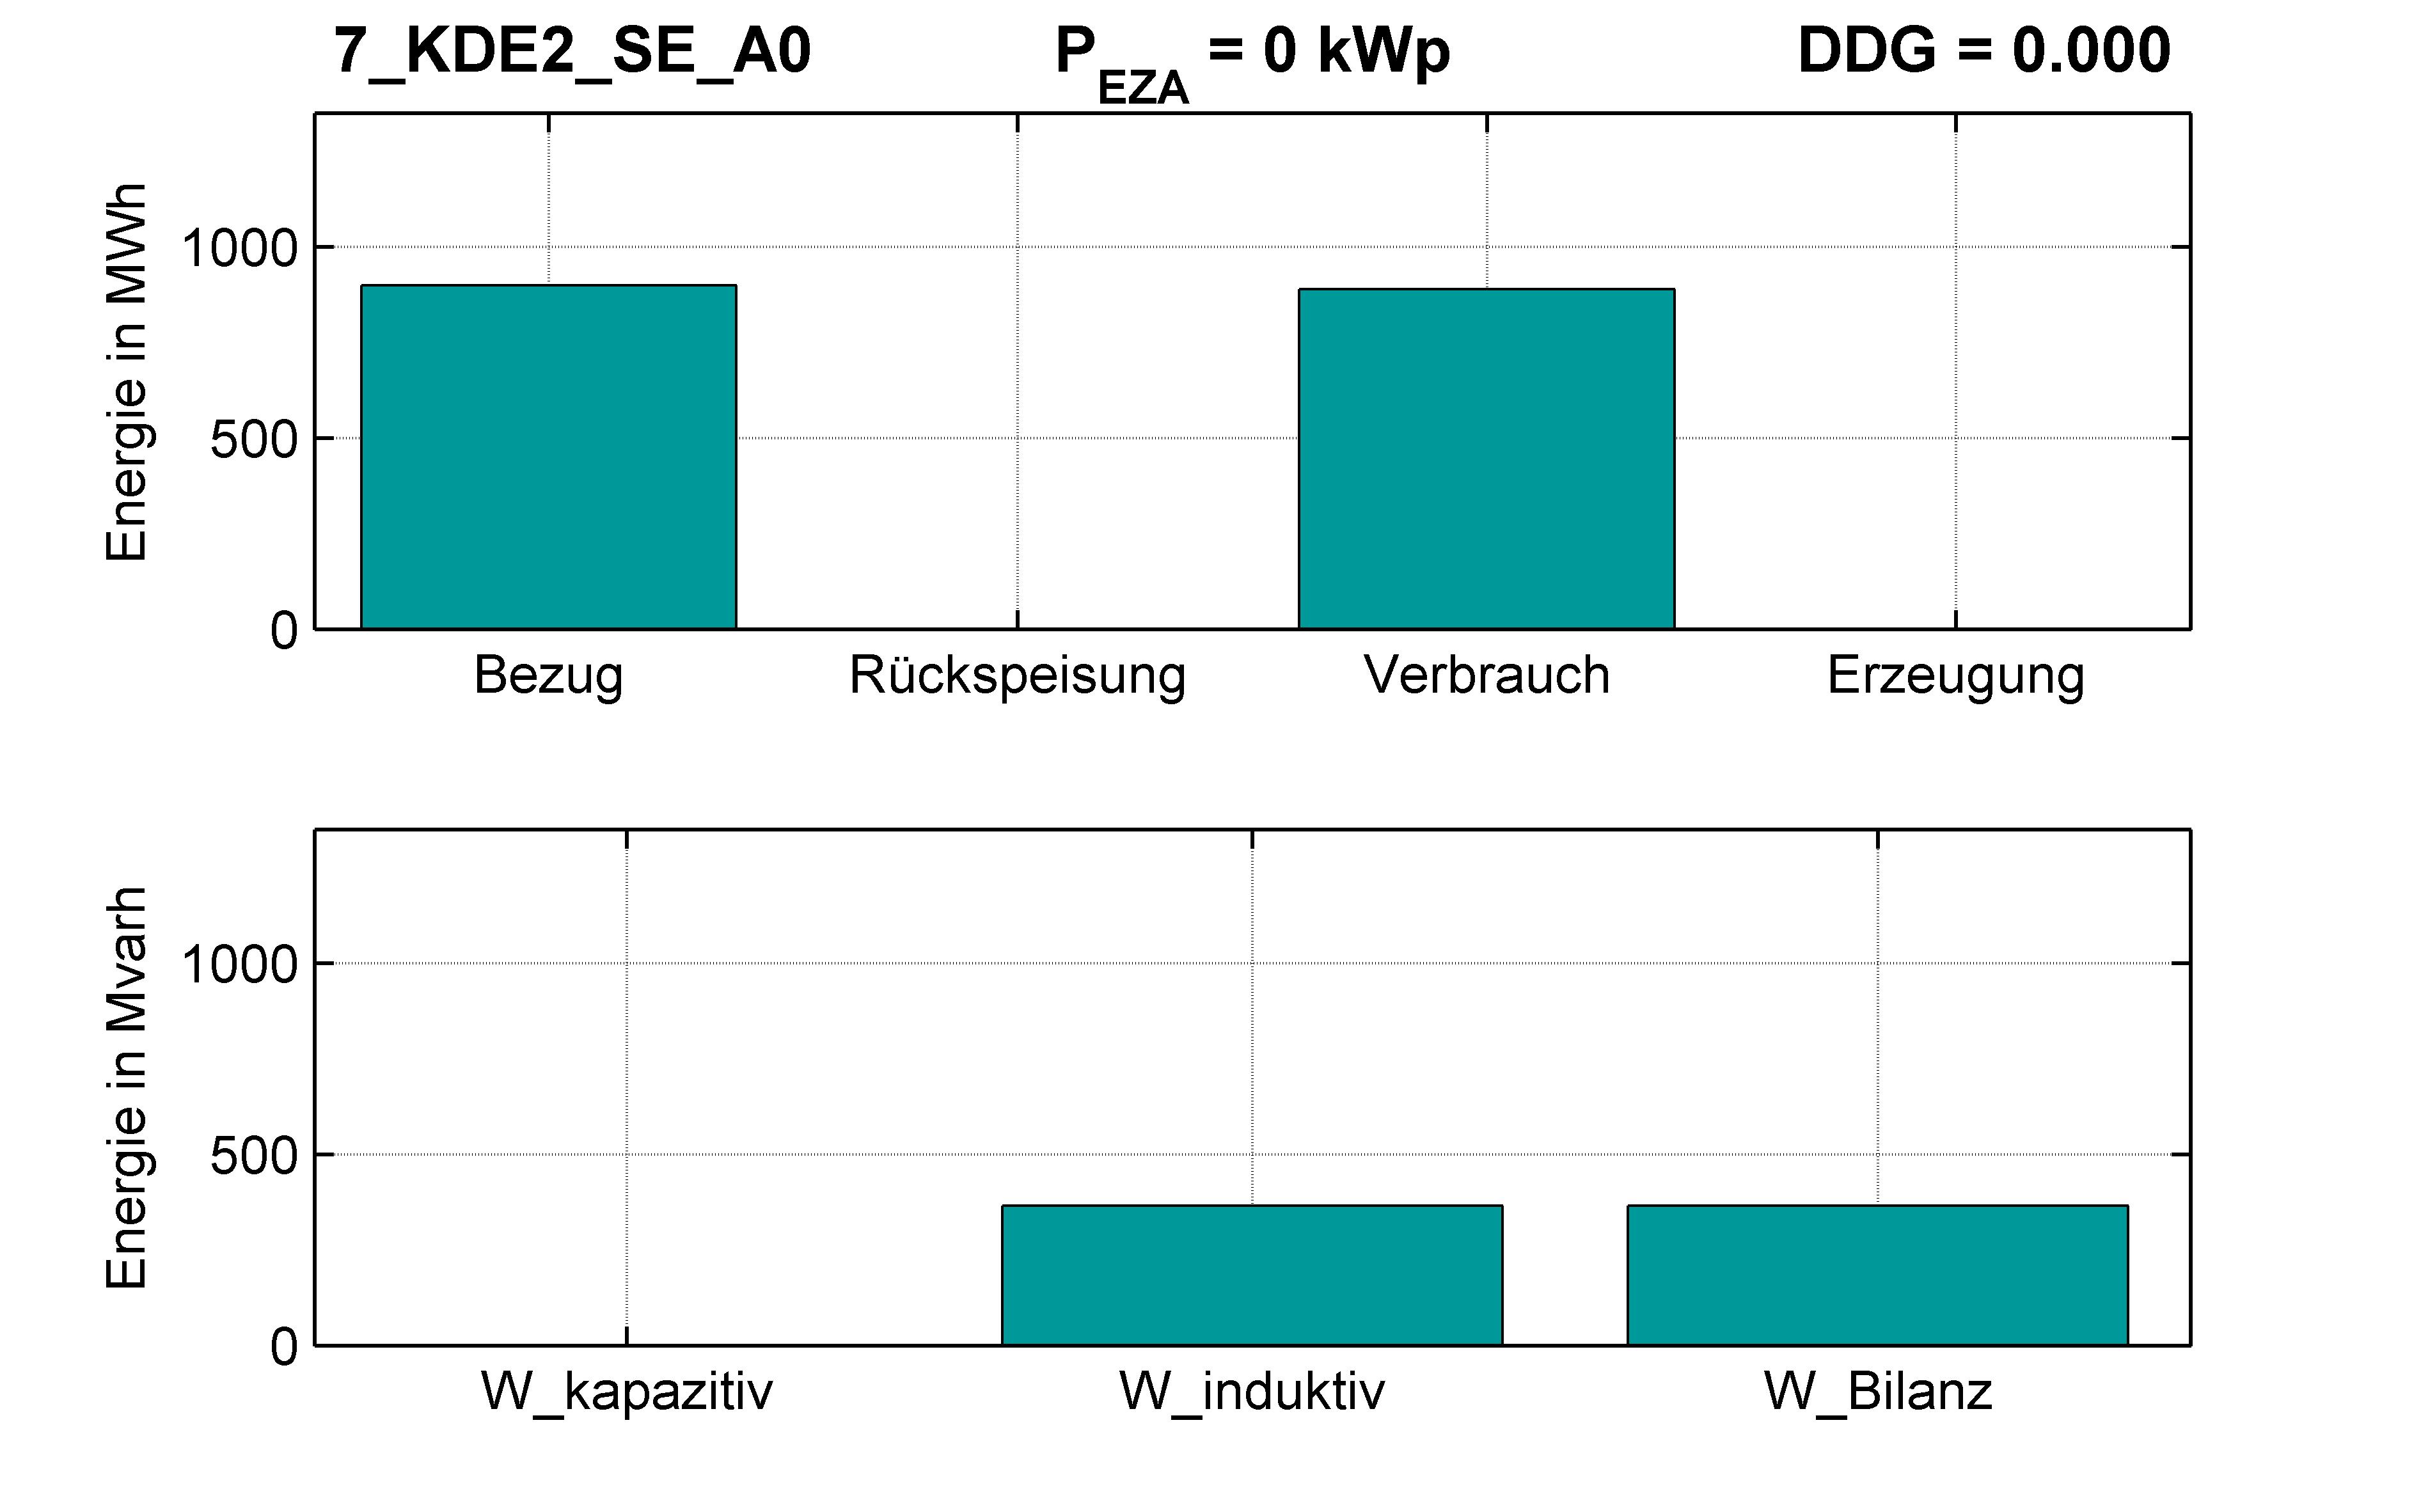 KDE2 | Längsregler (SE) A0 | PQ-Bilanz